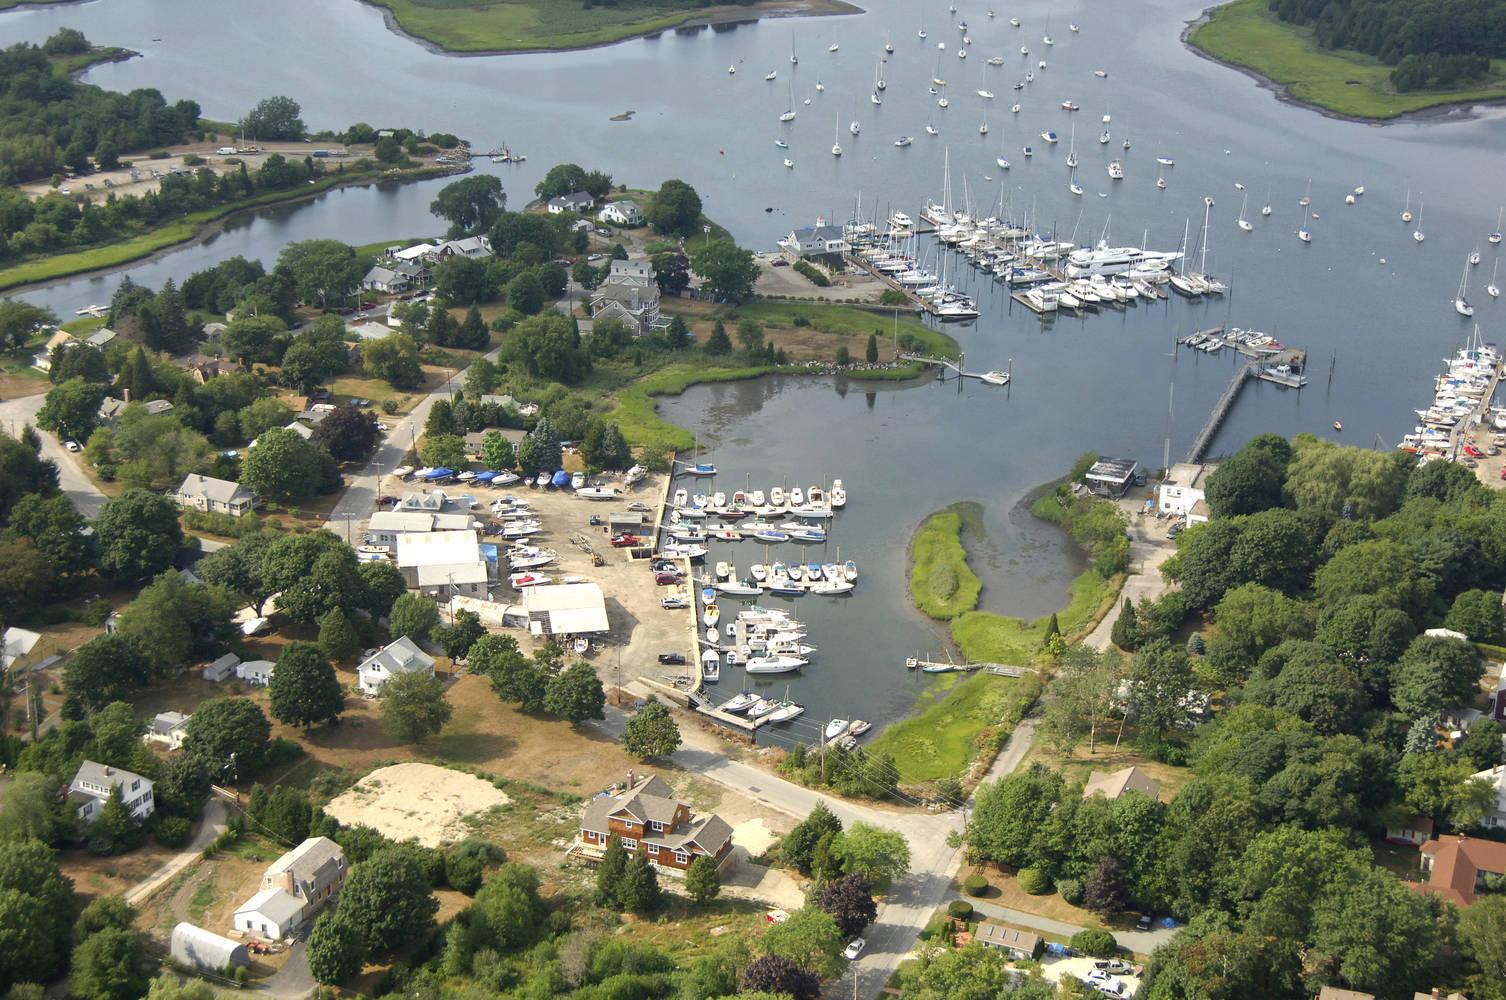 Northwick Boatyard